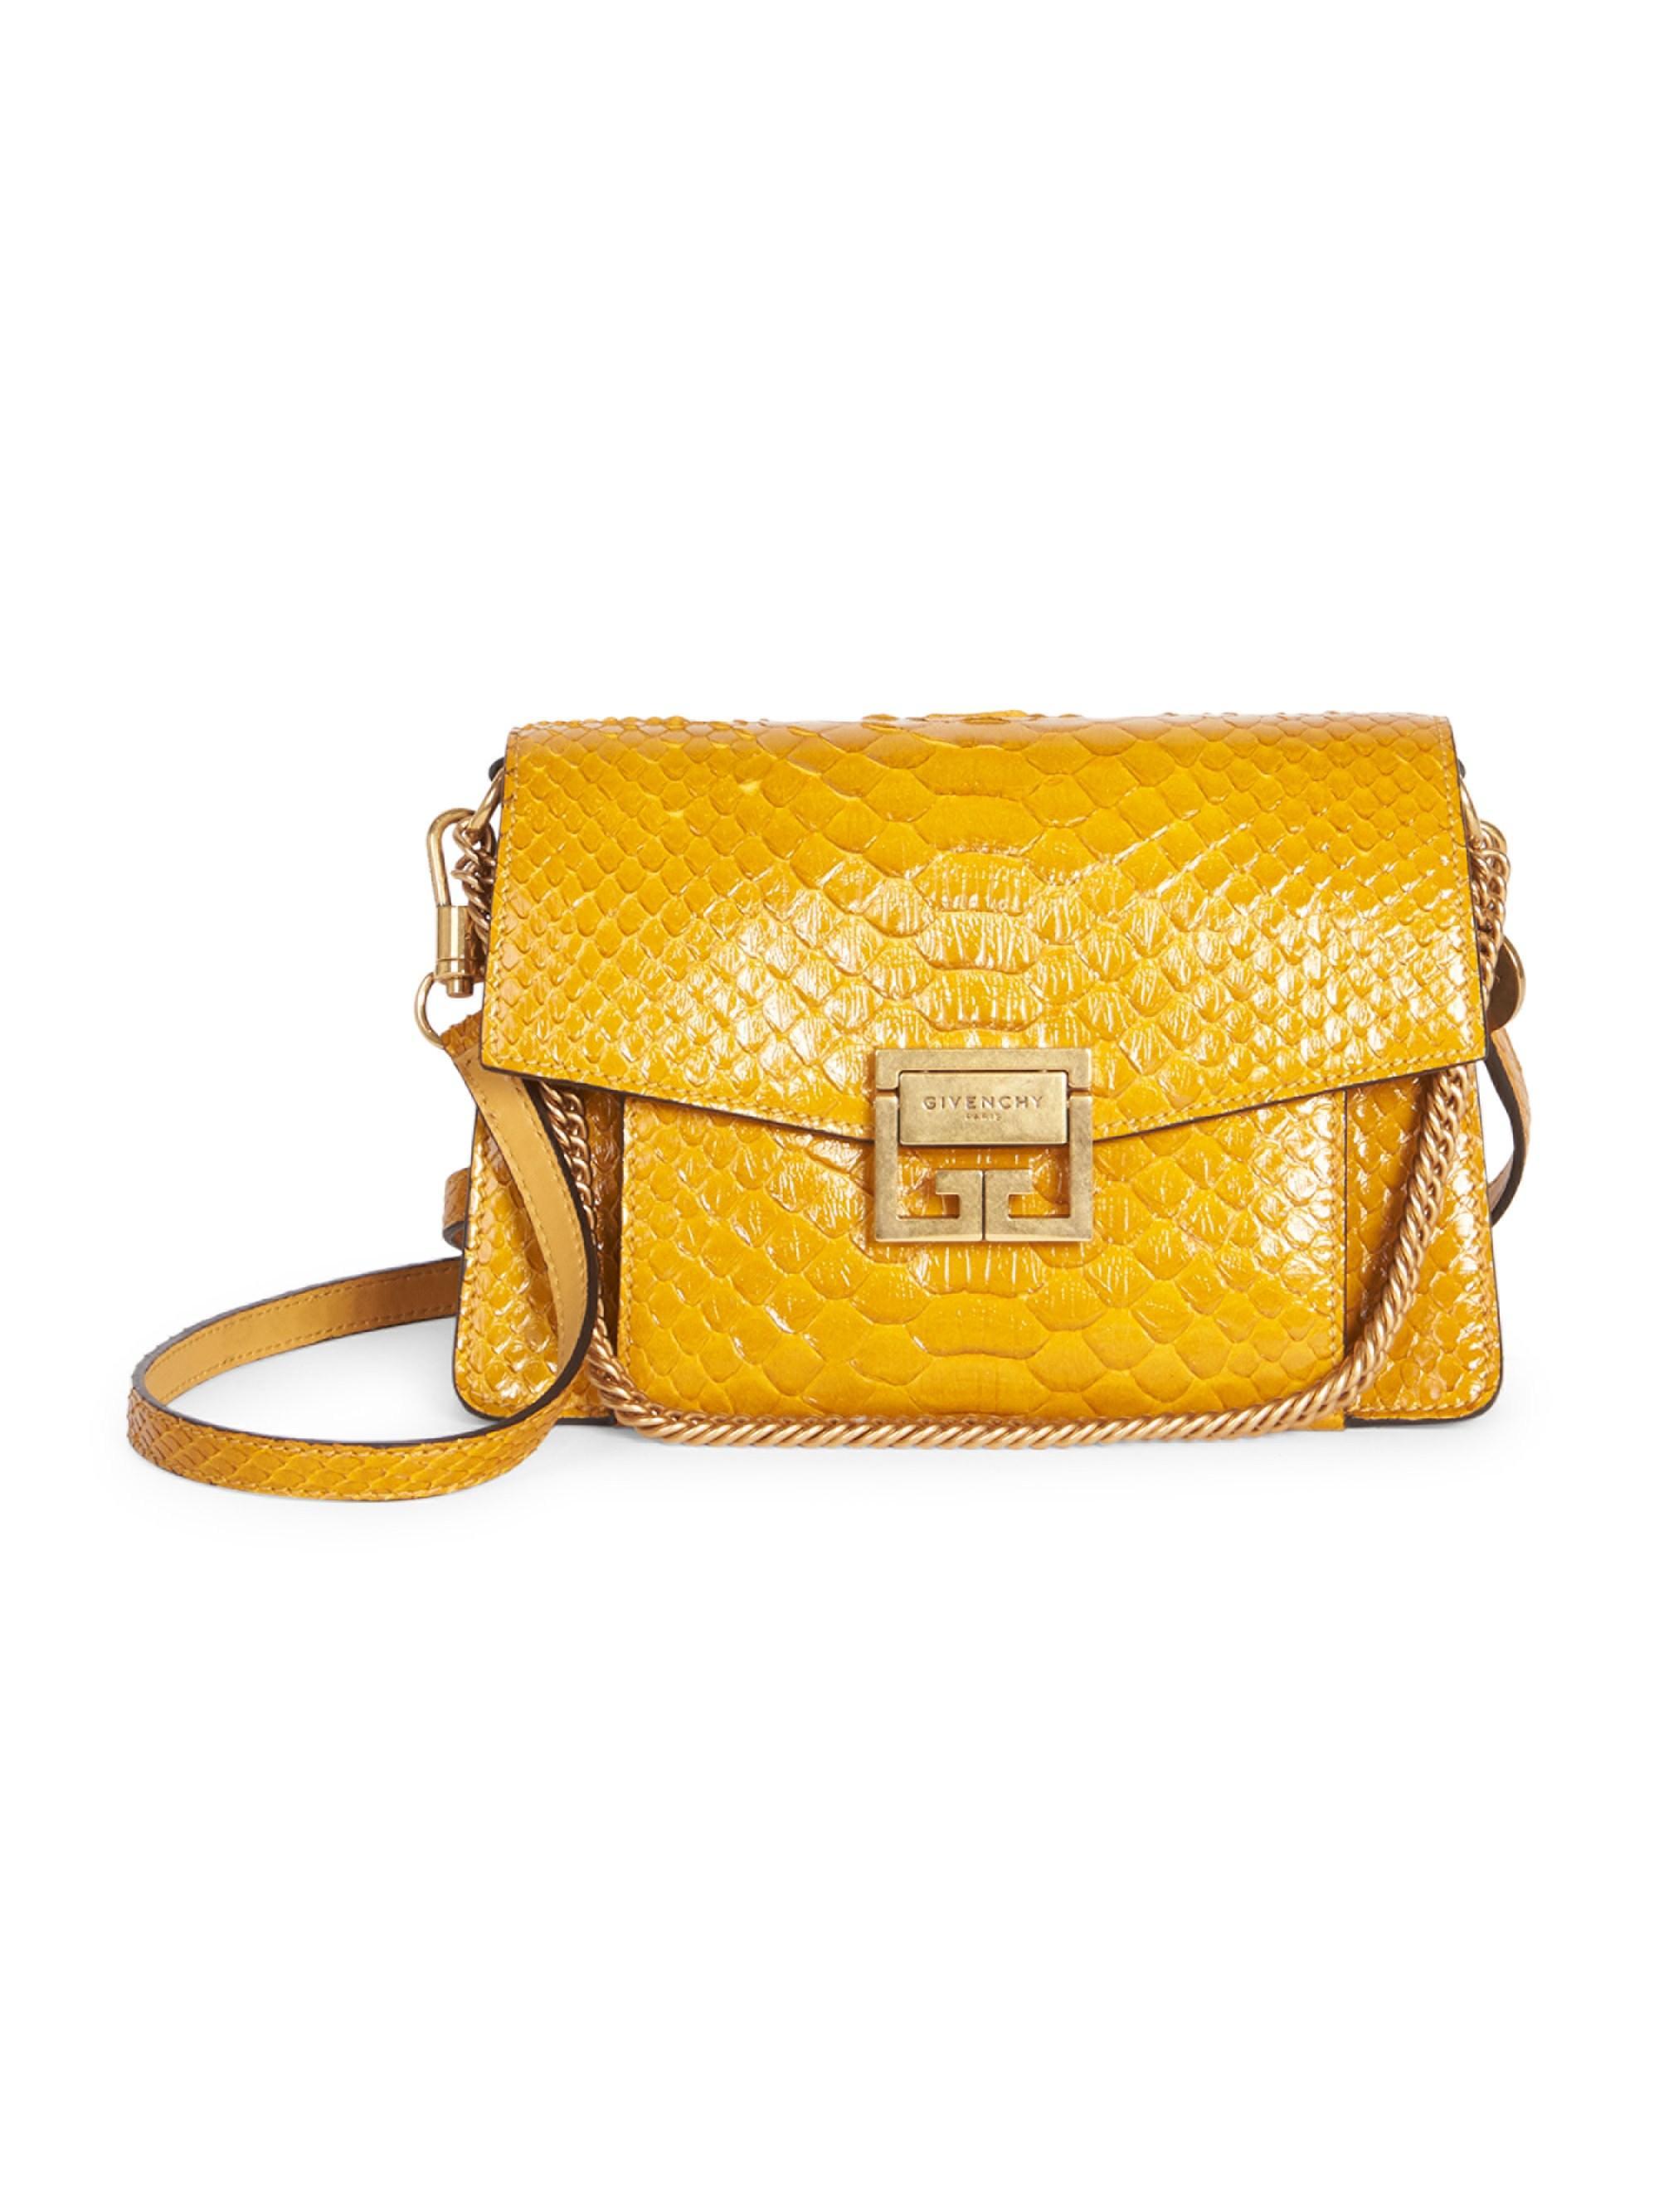 8f62d2c27e Givenchy - Metallic Women's Small Python Gv3 Shoulder Bag - Gold - Lyst.  View fullscreen